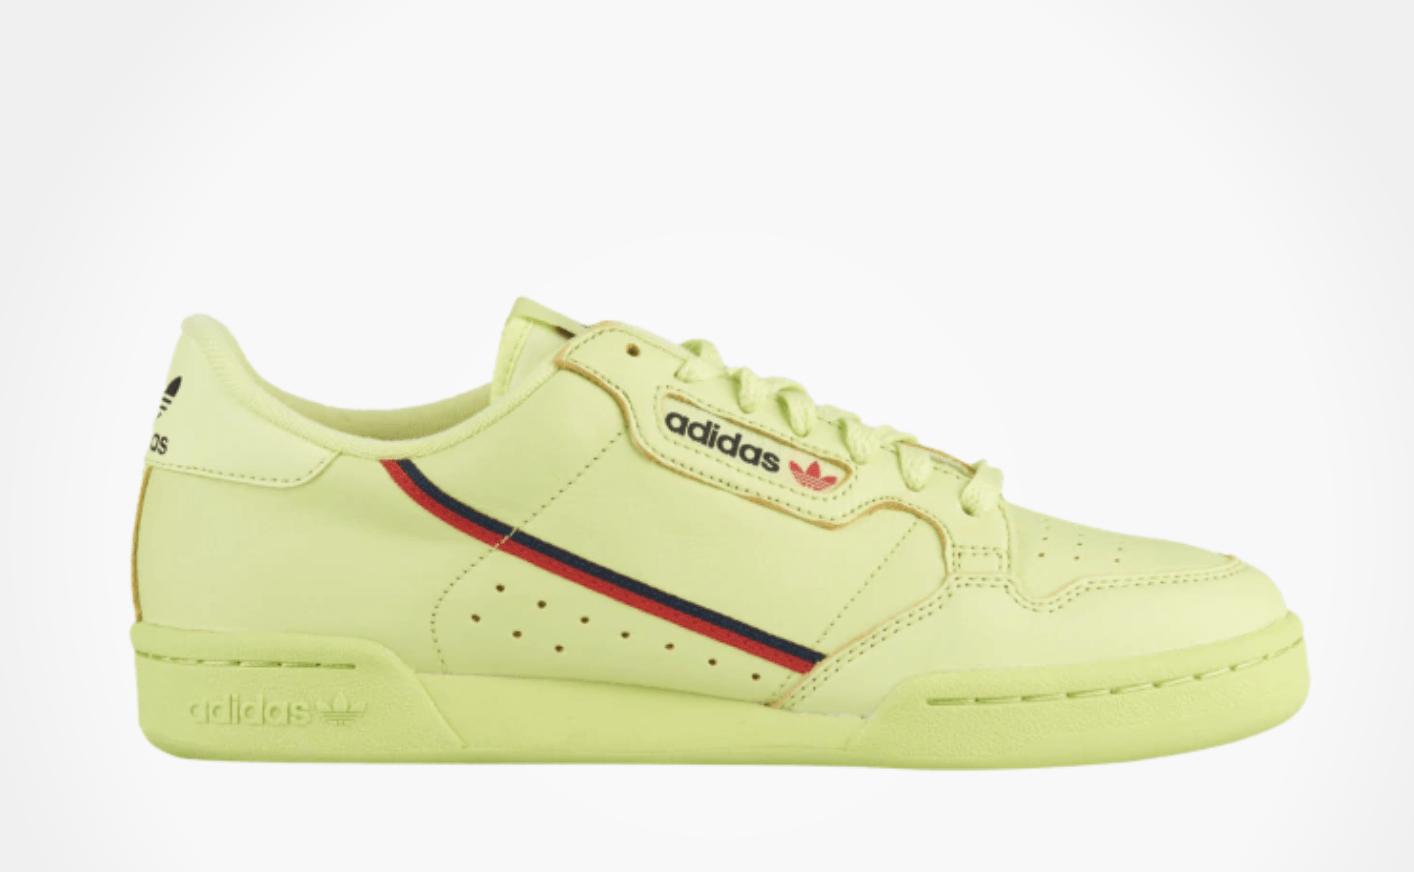 Abundancia Extensamente Levántate  adidas Continental 80's Yellow Blue Pink Release Info - JustFreshKicks